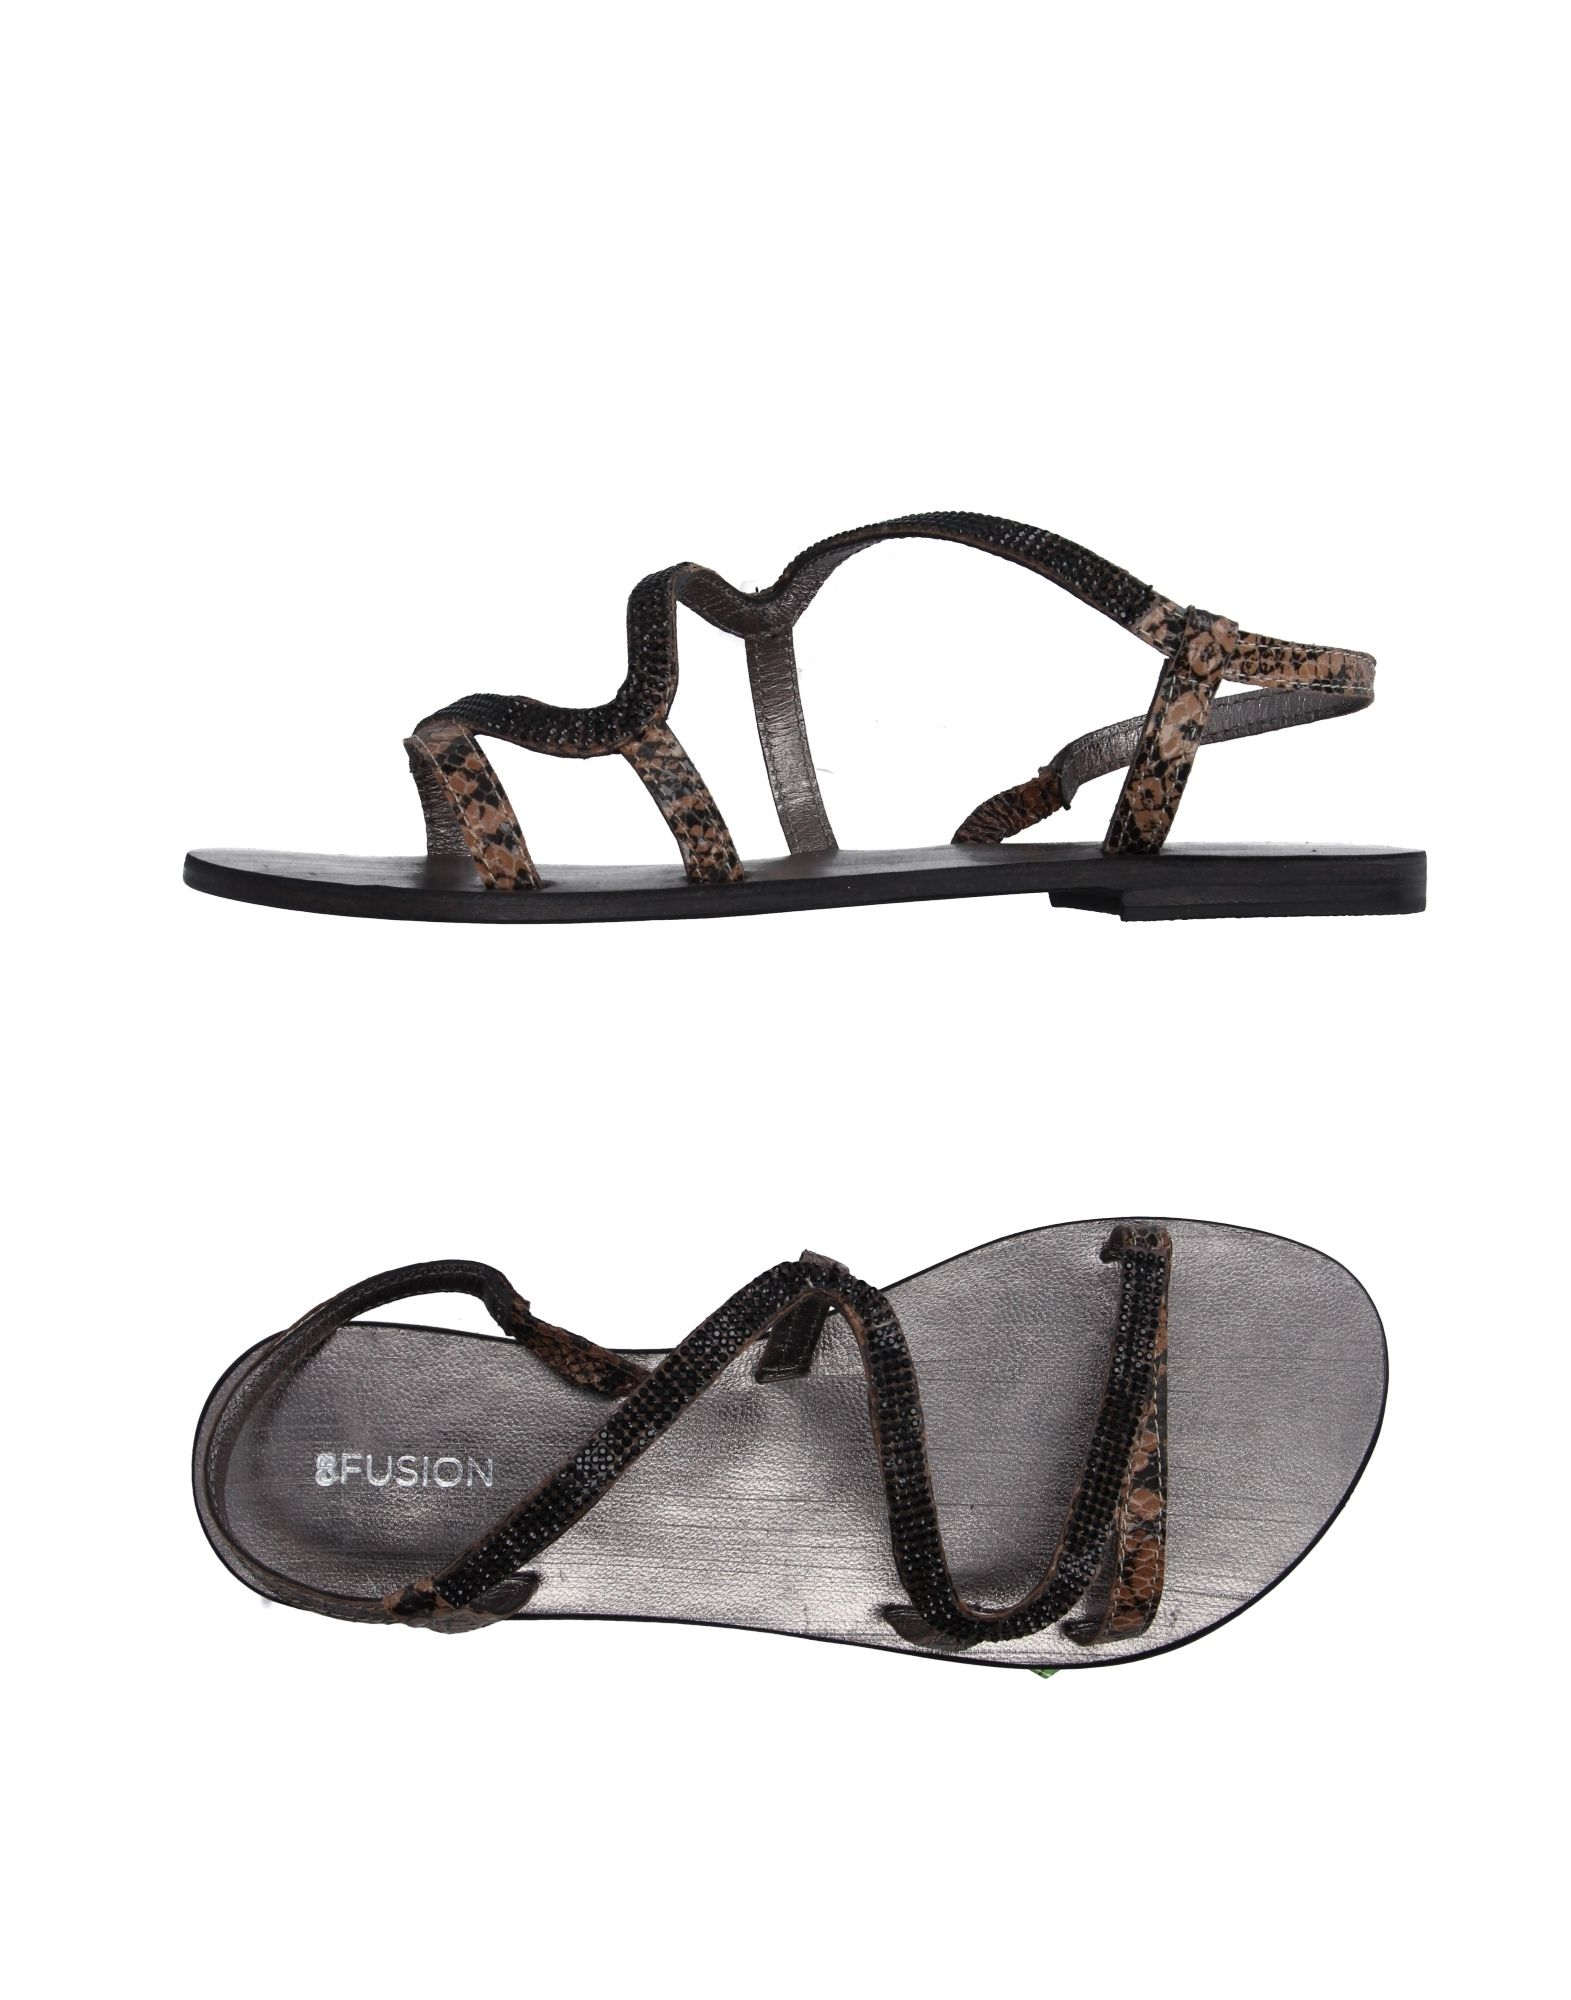 Cb Fusion Sandals